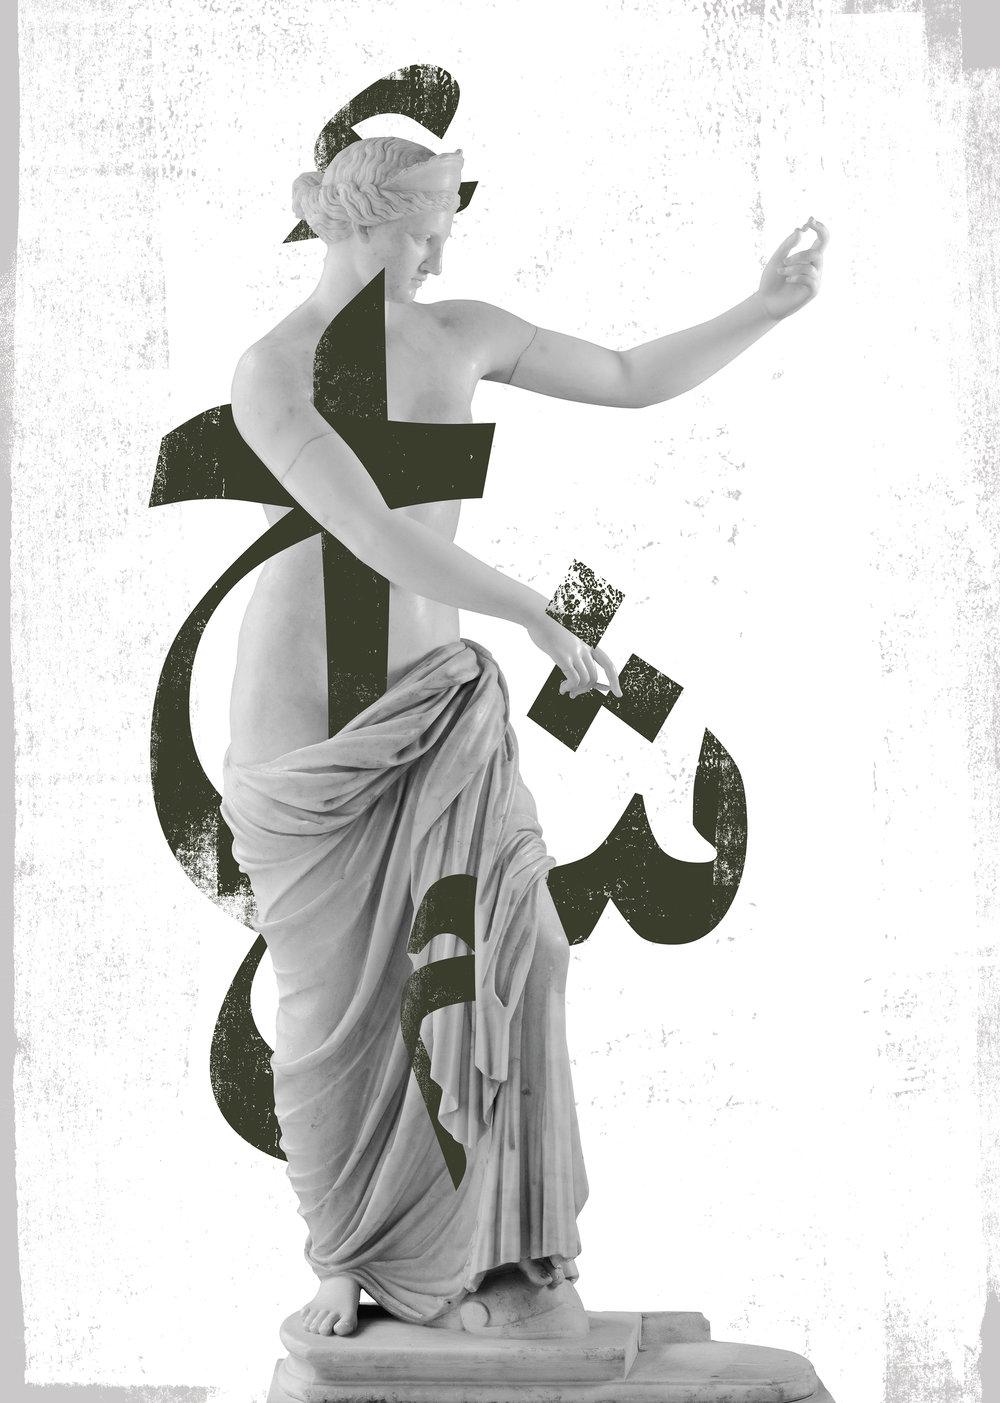 <b>Younes Zemmouri</b></br><i>Ashem (Shame</i> series)</br>digital art print on archival paper</br>limited edition of 30</br>20 x 16 inches</br>$400 unframed / $600 framed